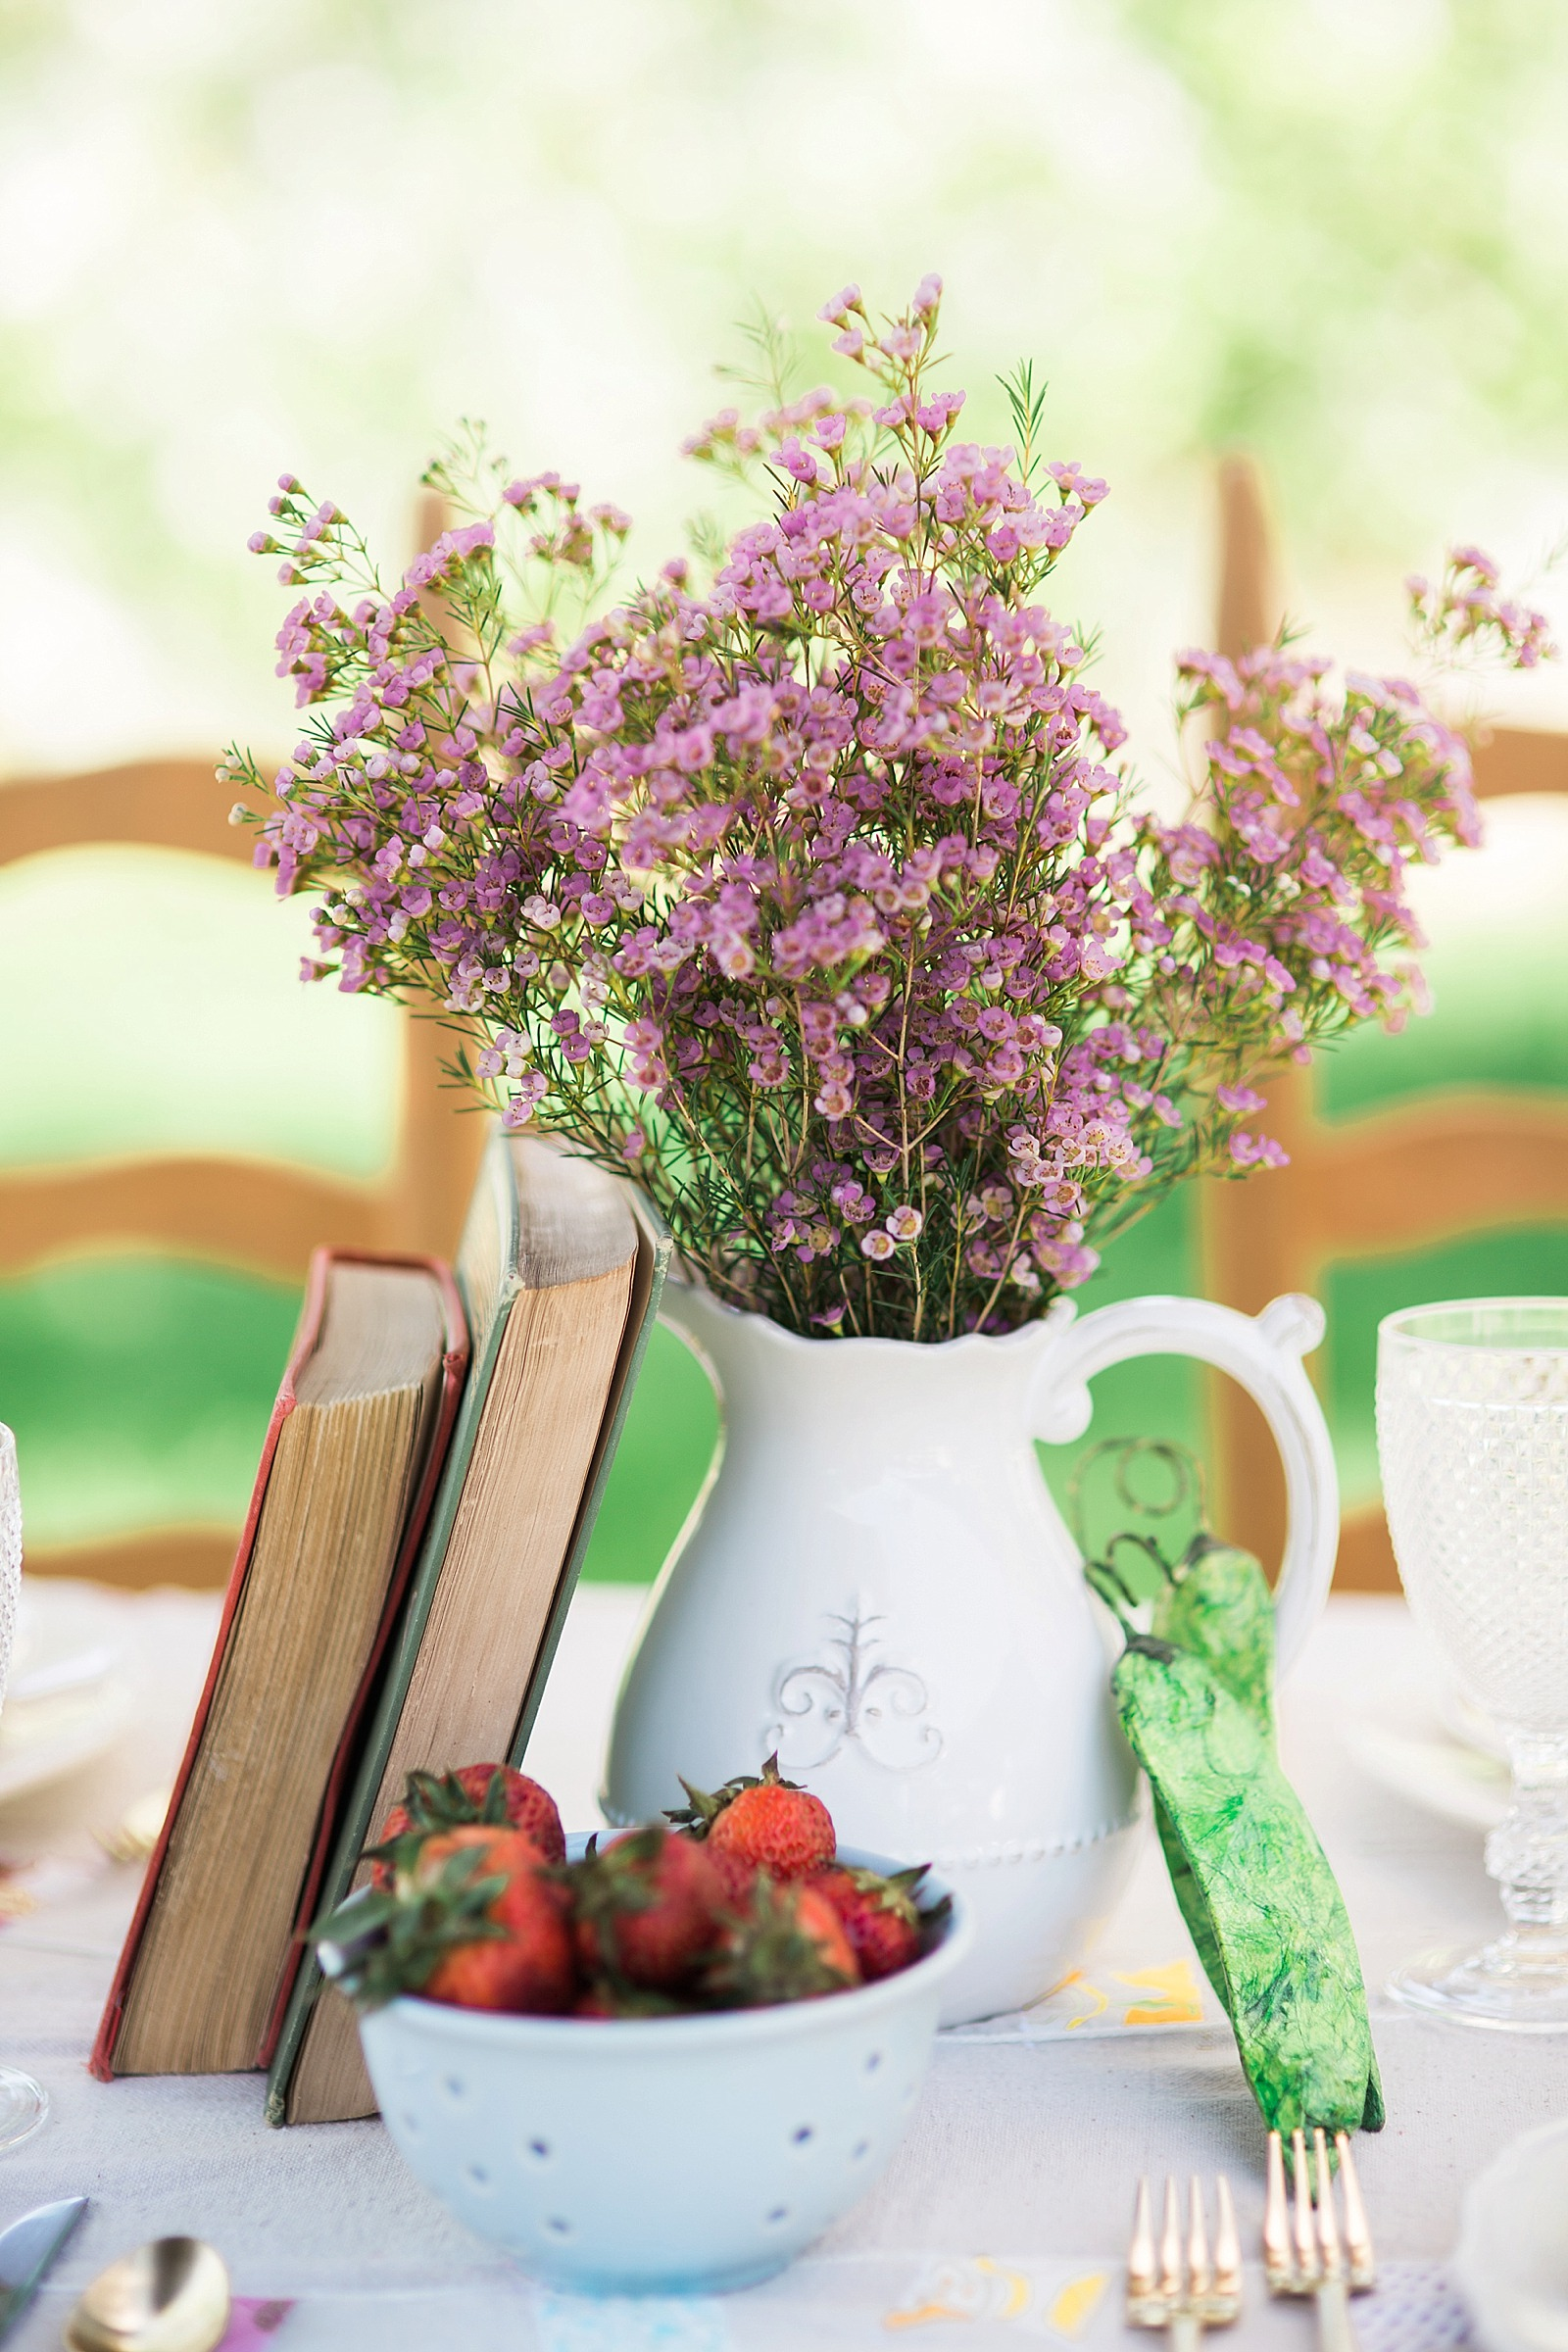 diana-elizabeth-blog-lifestyle-dunkin-creamers-dunkin-donuts-brunch-book-club--4530